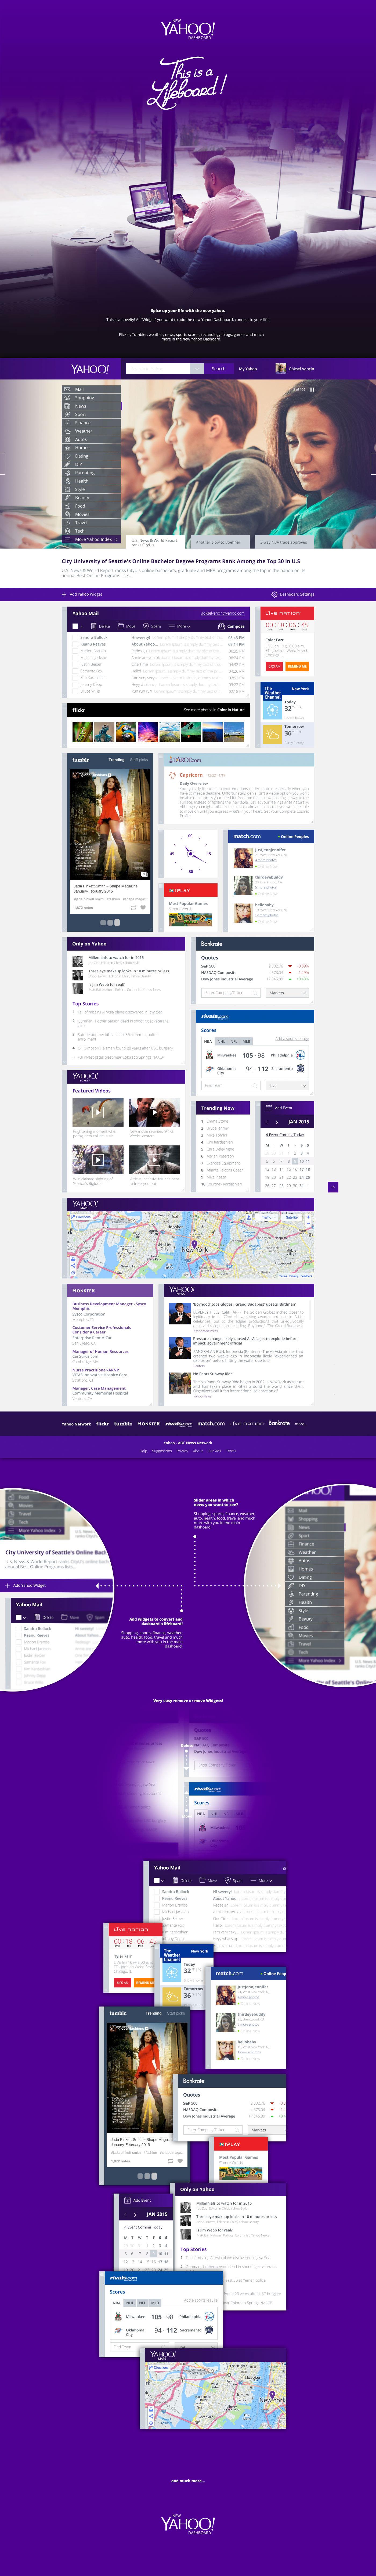 dashboard portal news wall main purple dark life live social interactive innovation media inspiration user